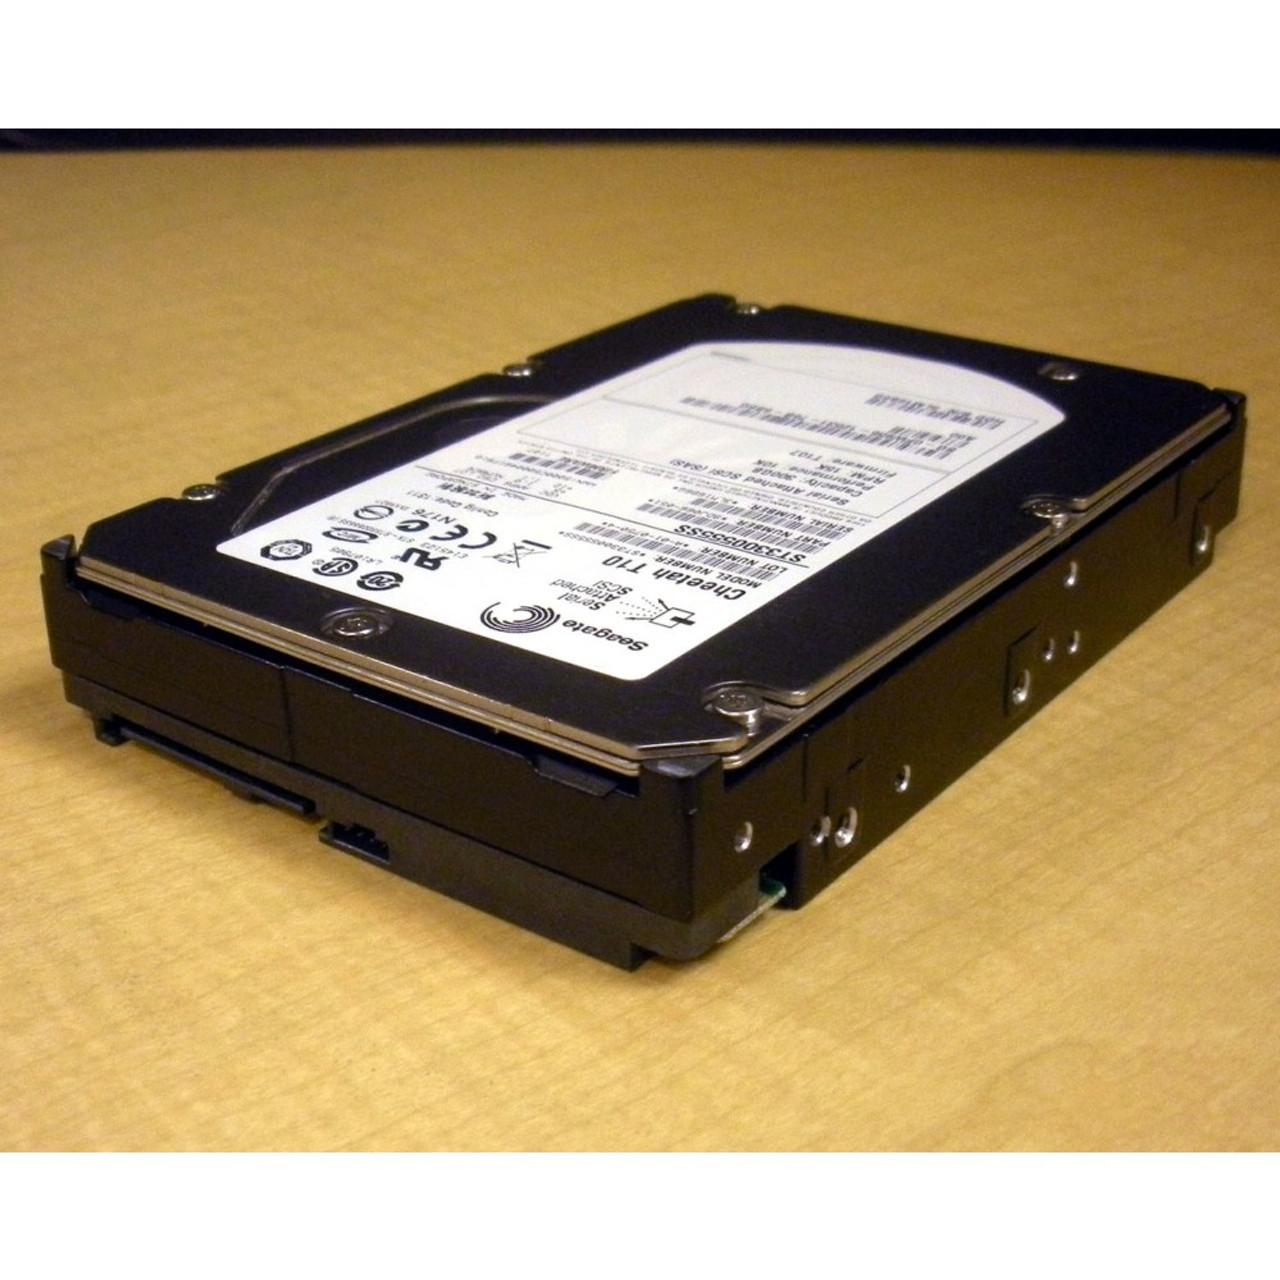 "SEAGATE ST3300555SS 300GB 10K 3.5/"" SAS HARD DRIVE"